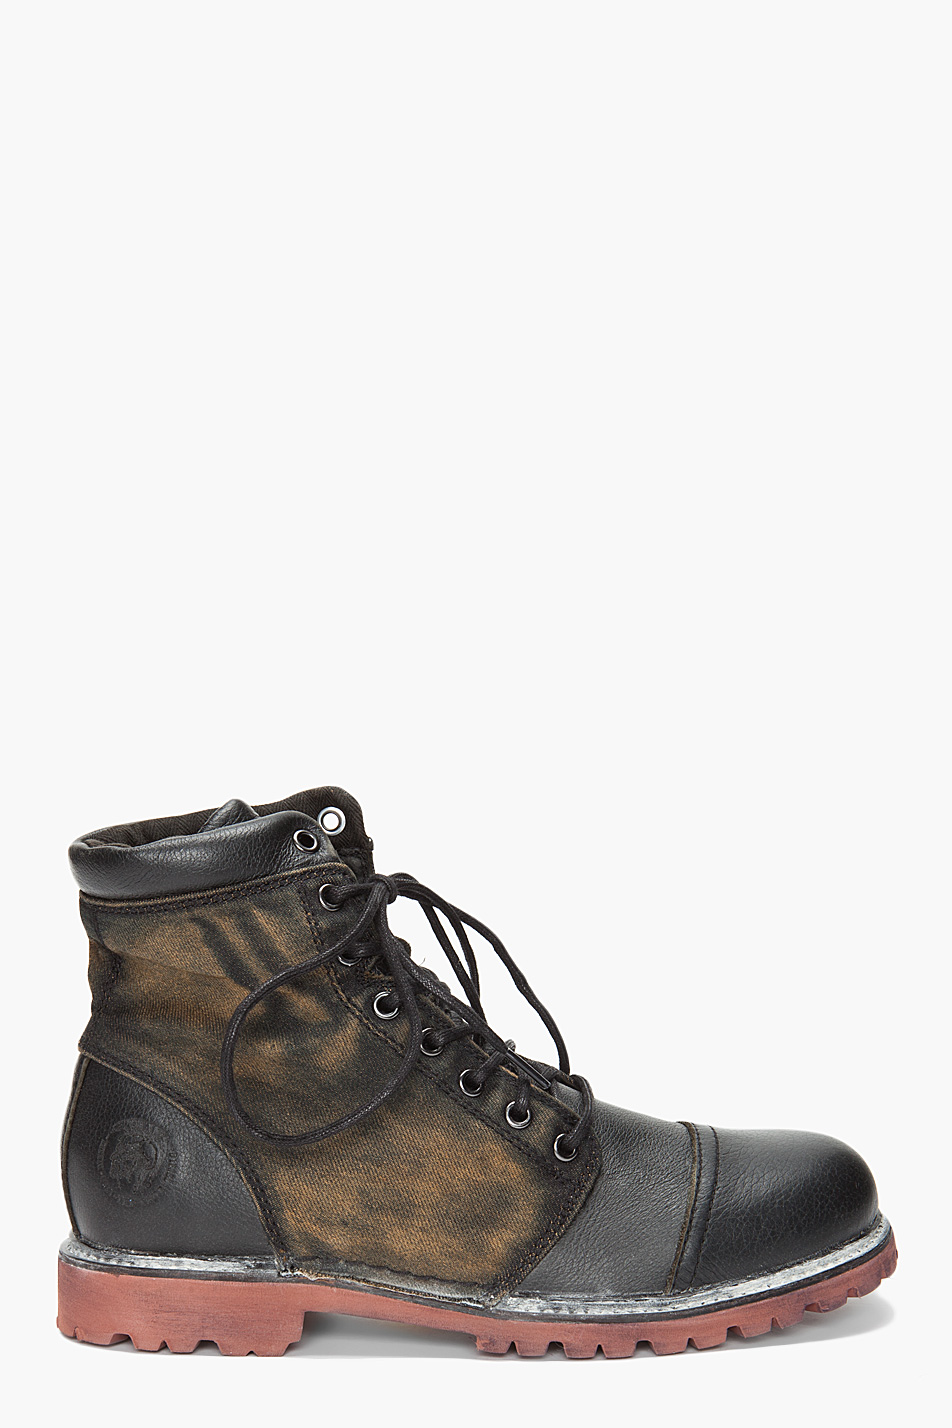 Lyst - Diesel Hill Boots in Black for Men